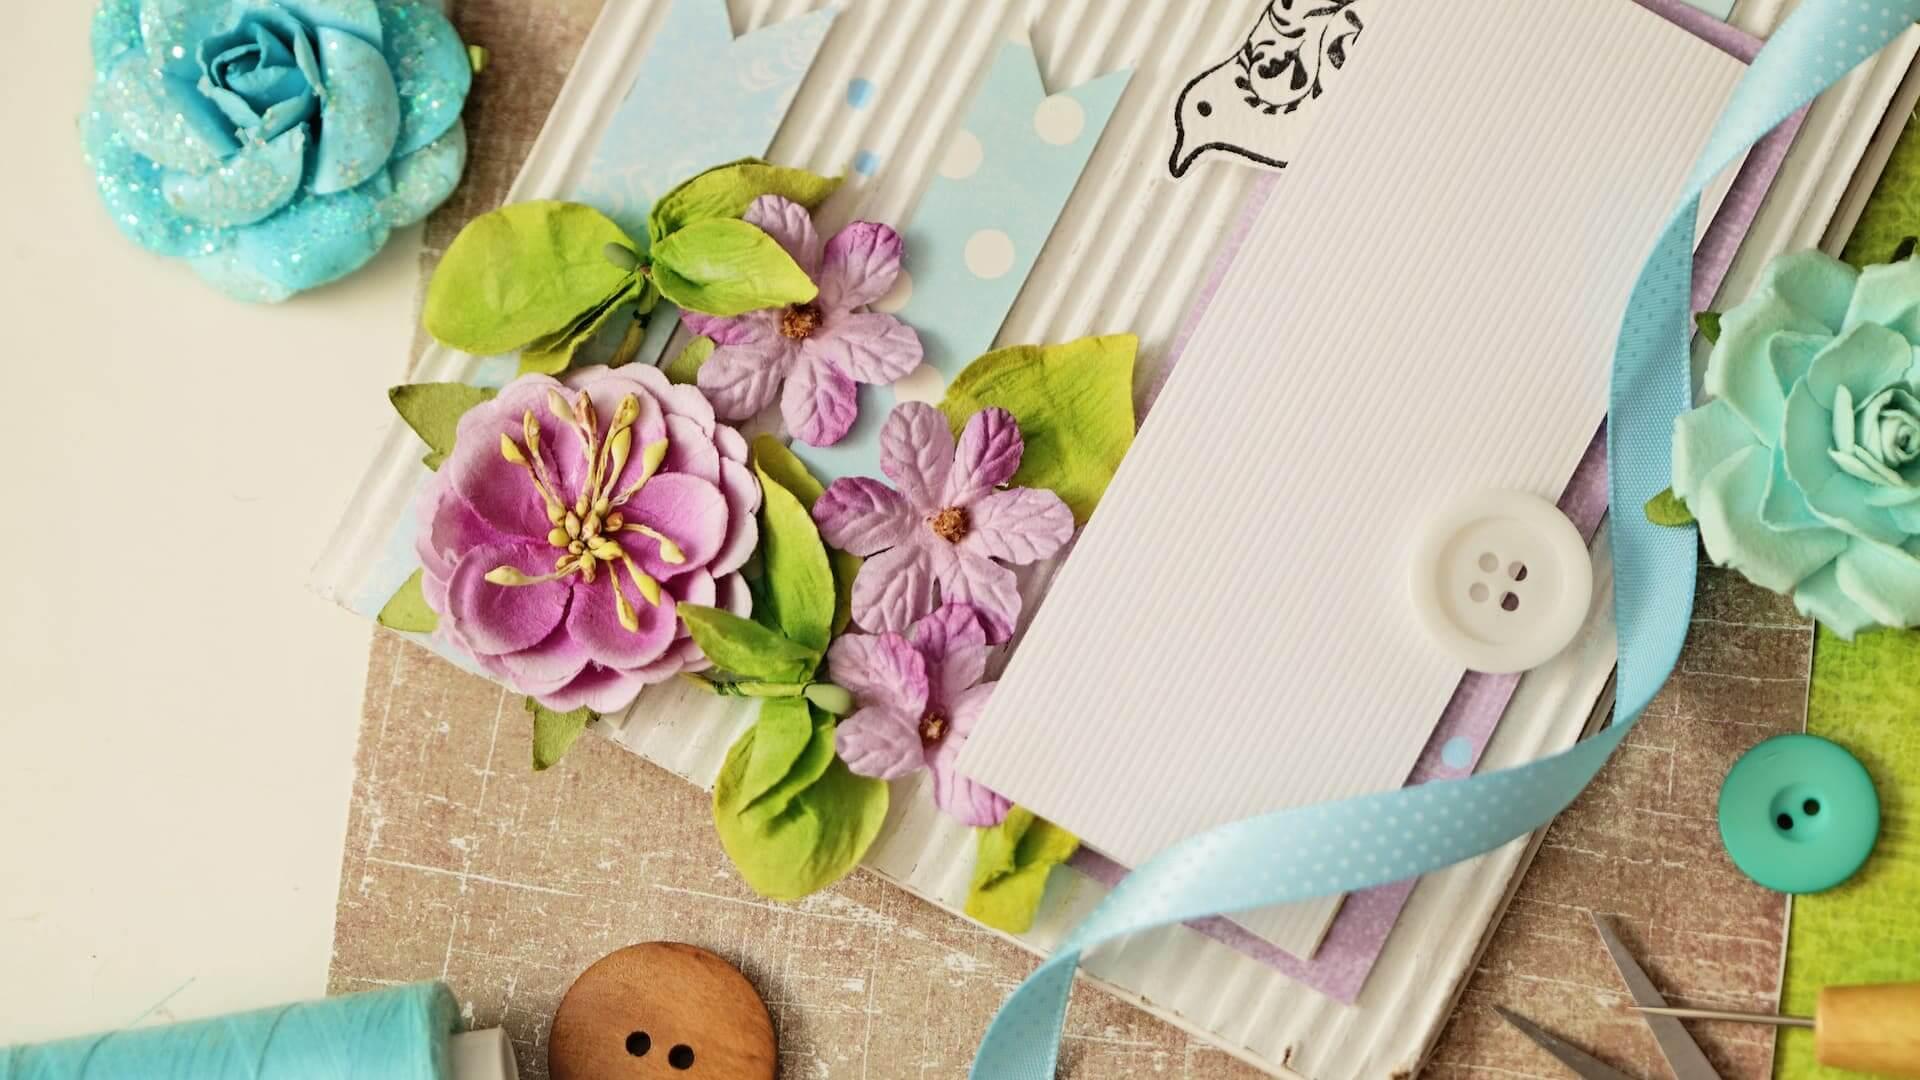 scrap booking. making of greeting card